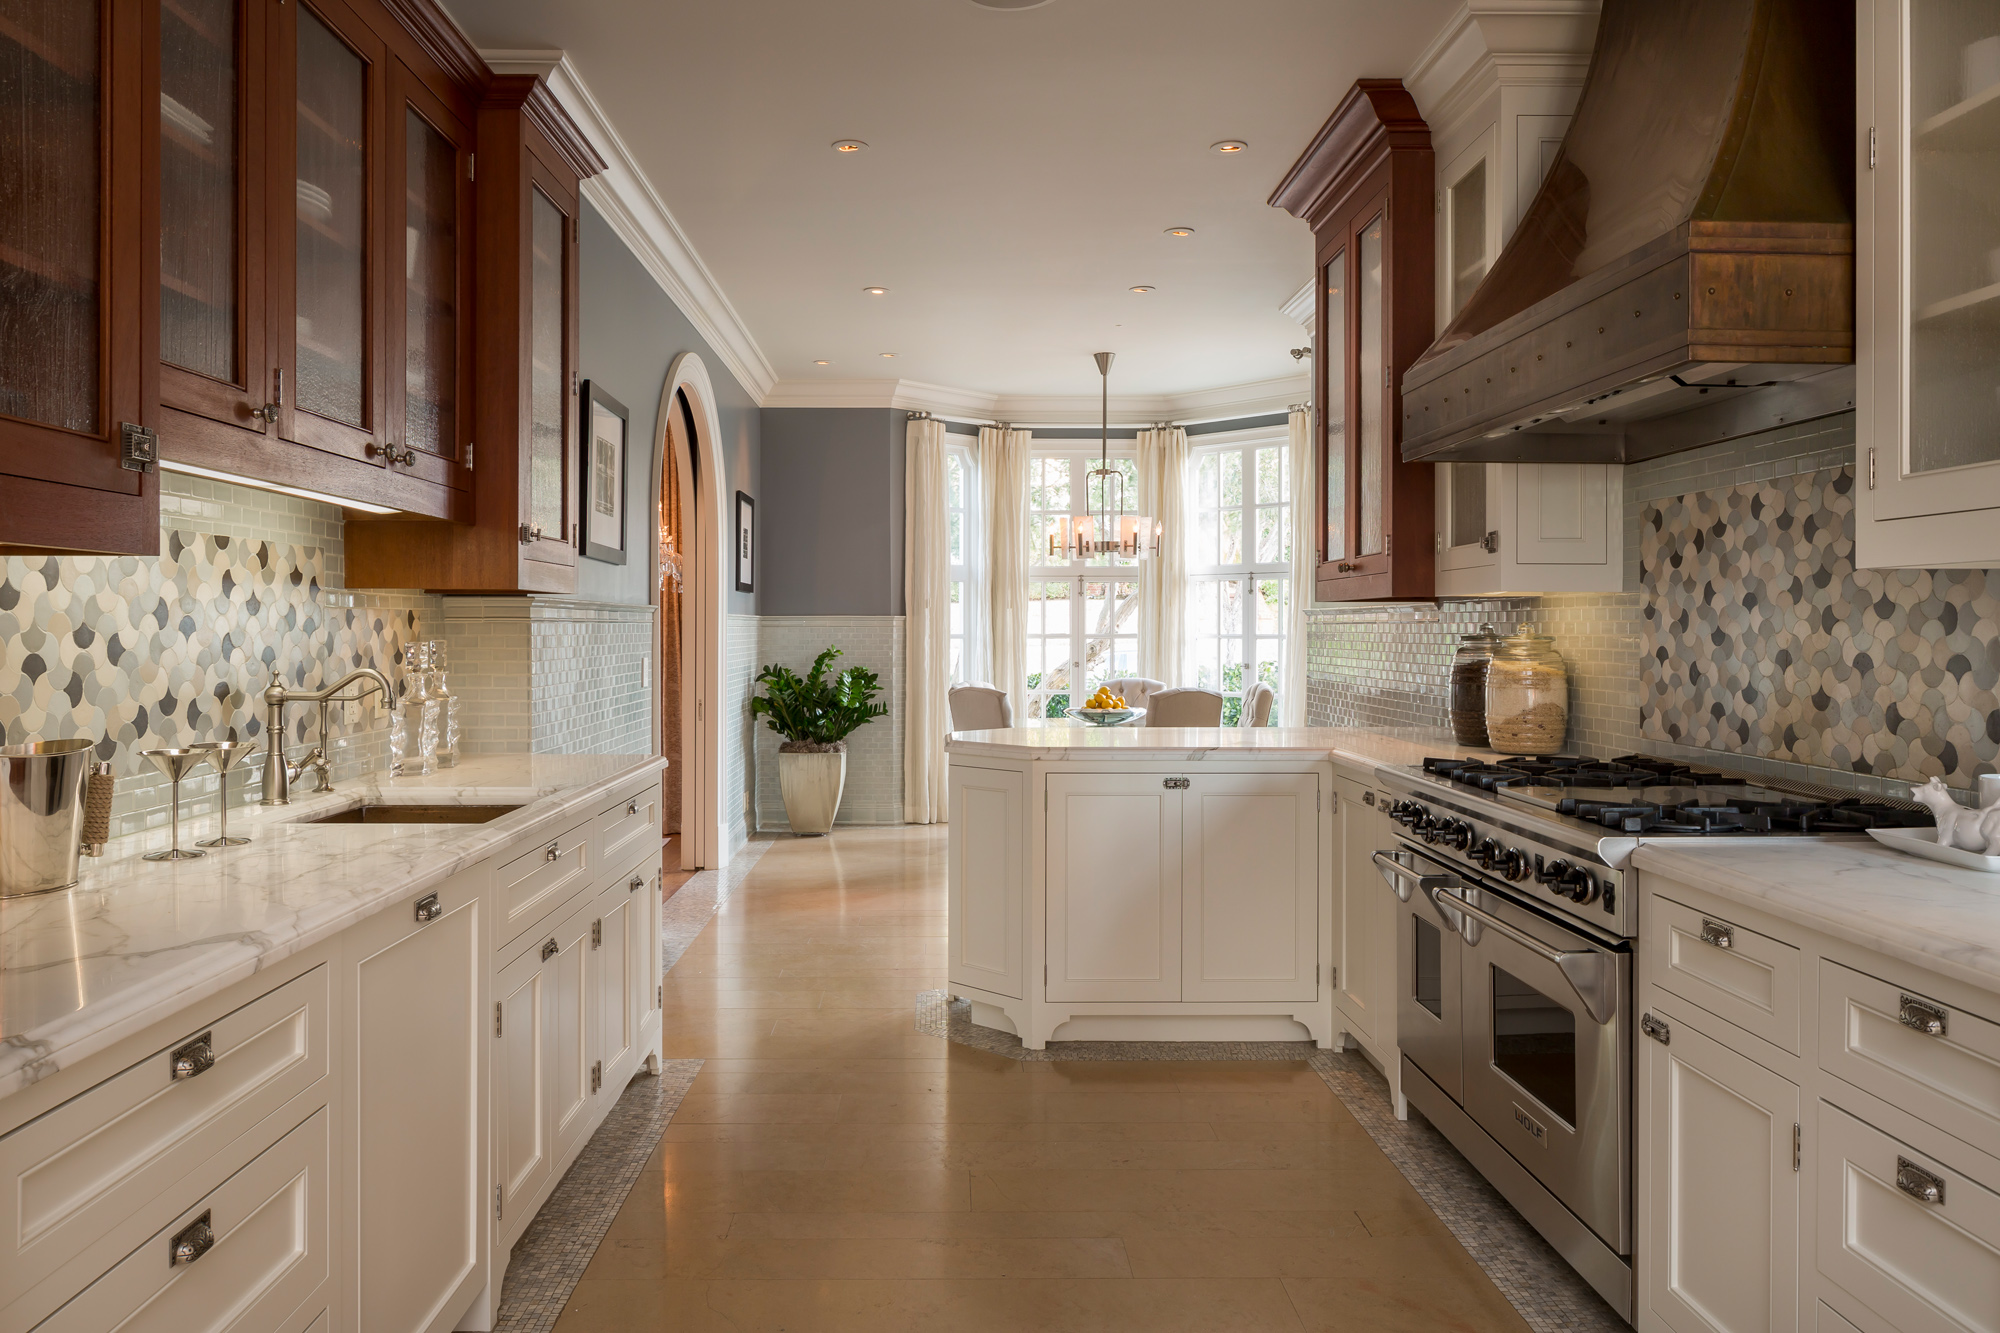 L1_Kitchen_6332.jpg